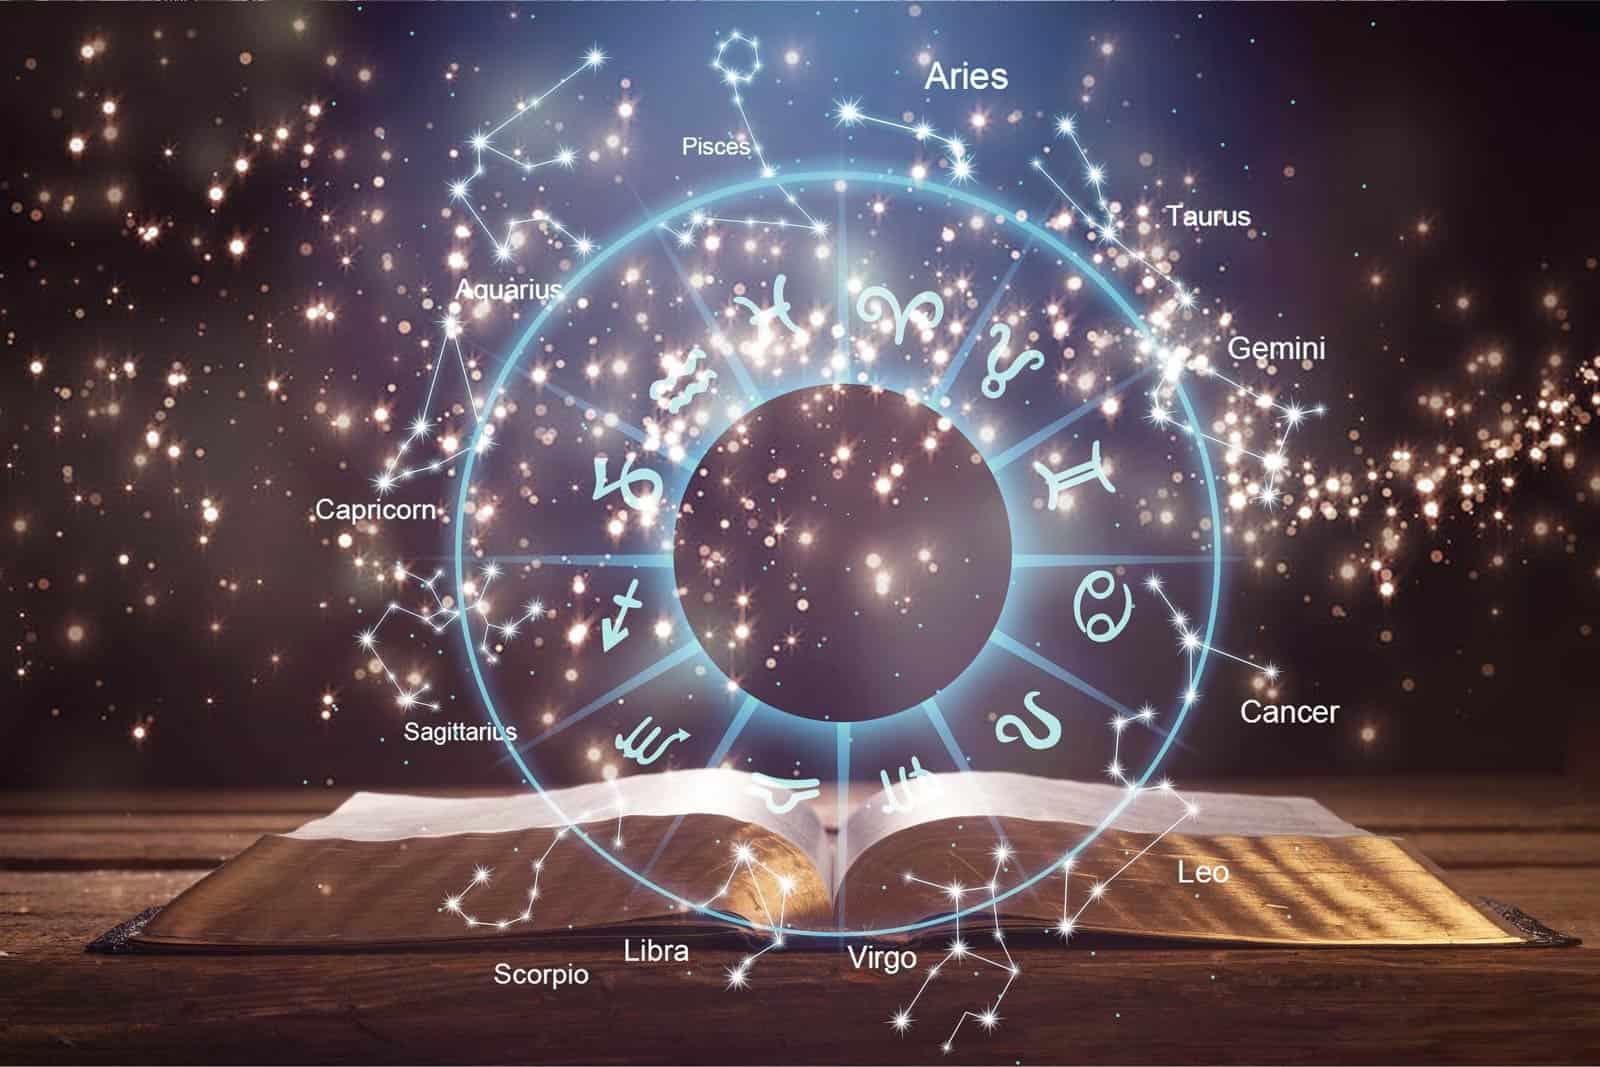 izrada astro astro